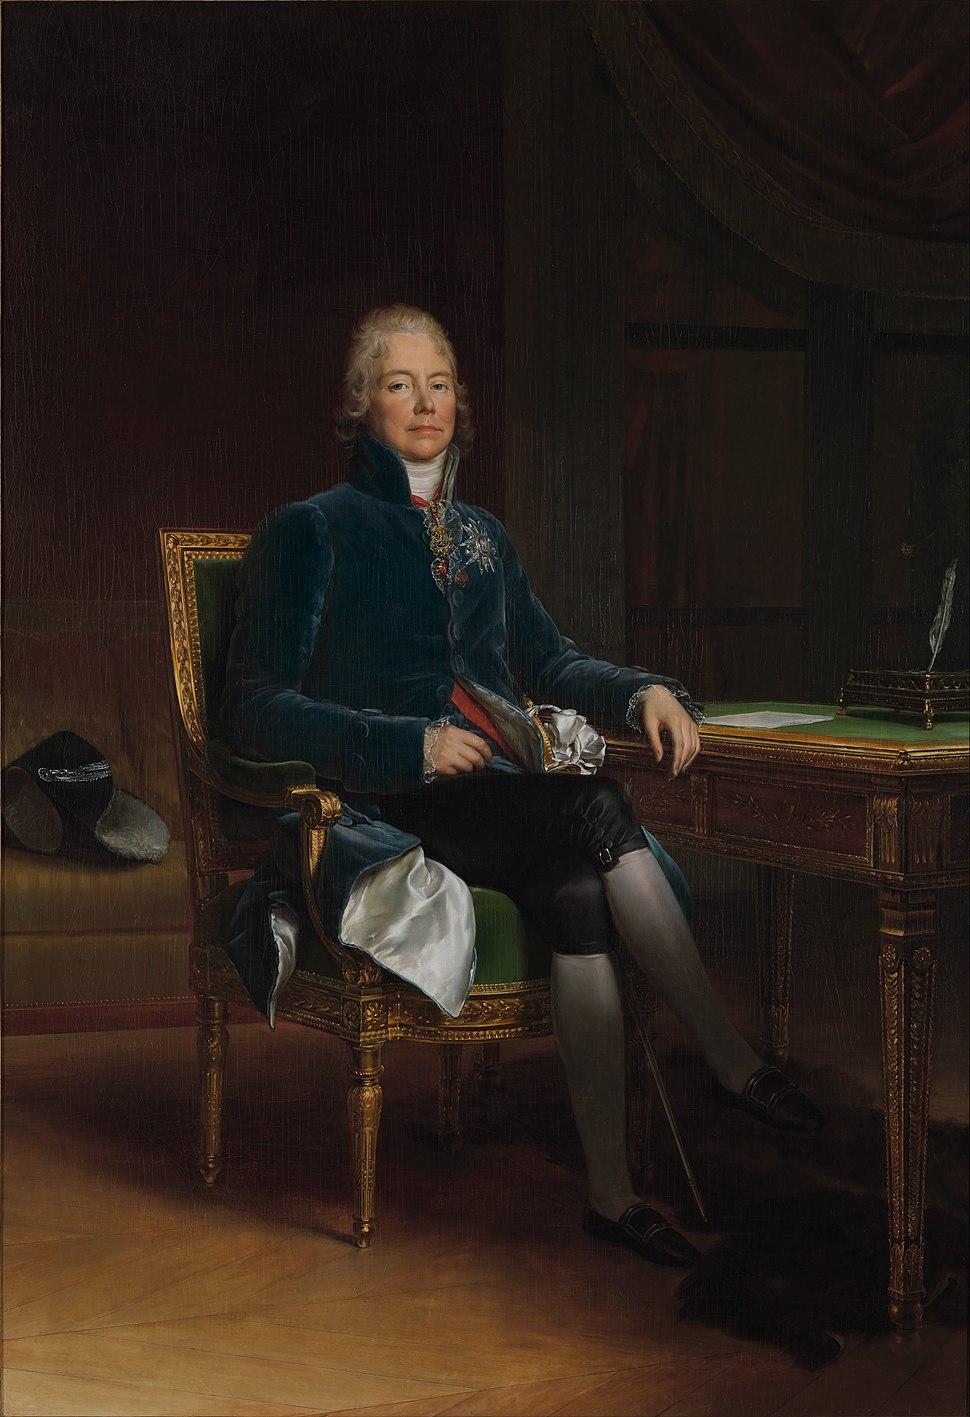 Charles Maurice de Talleyrand-Périgord by François Gérard, 1808